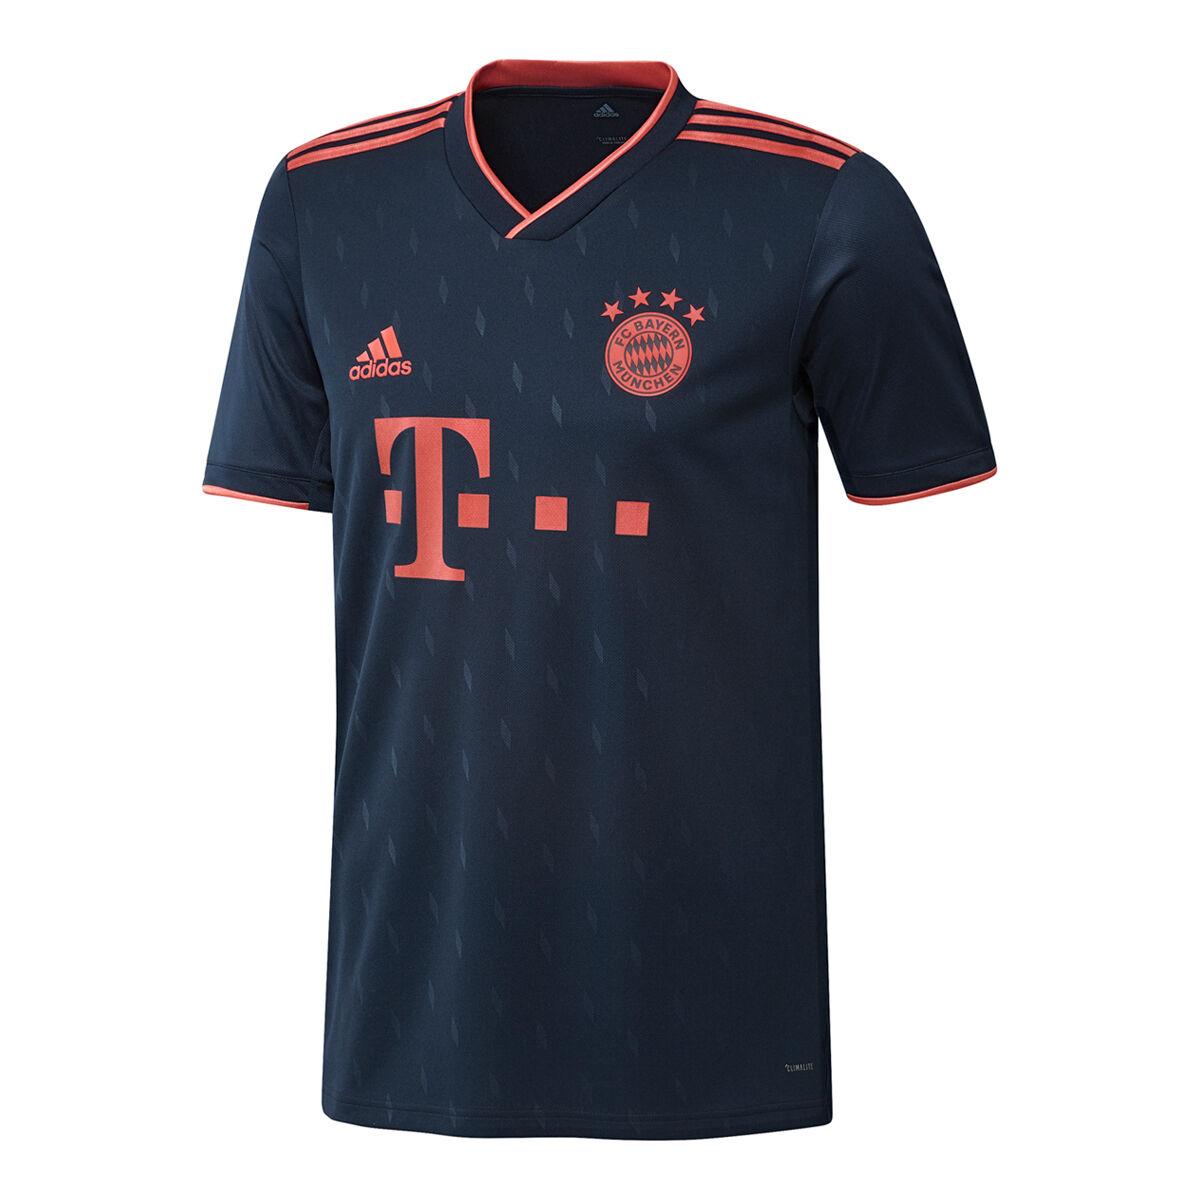 Details about Adidas FC Bayern Munich Football Soccer Kids Training Jacket Track Top 2019 2020